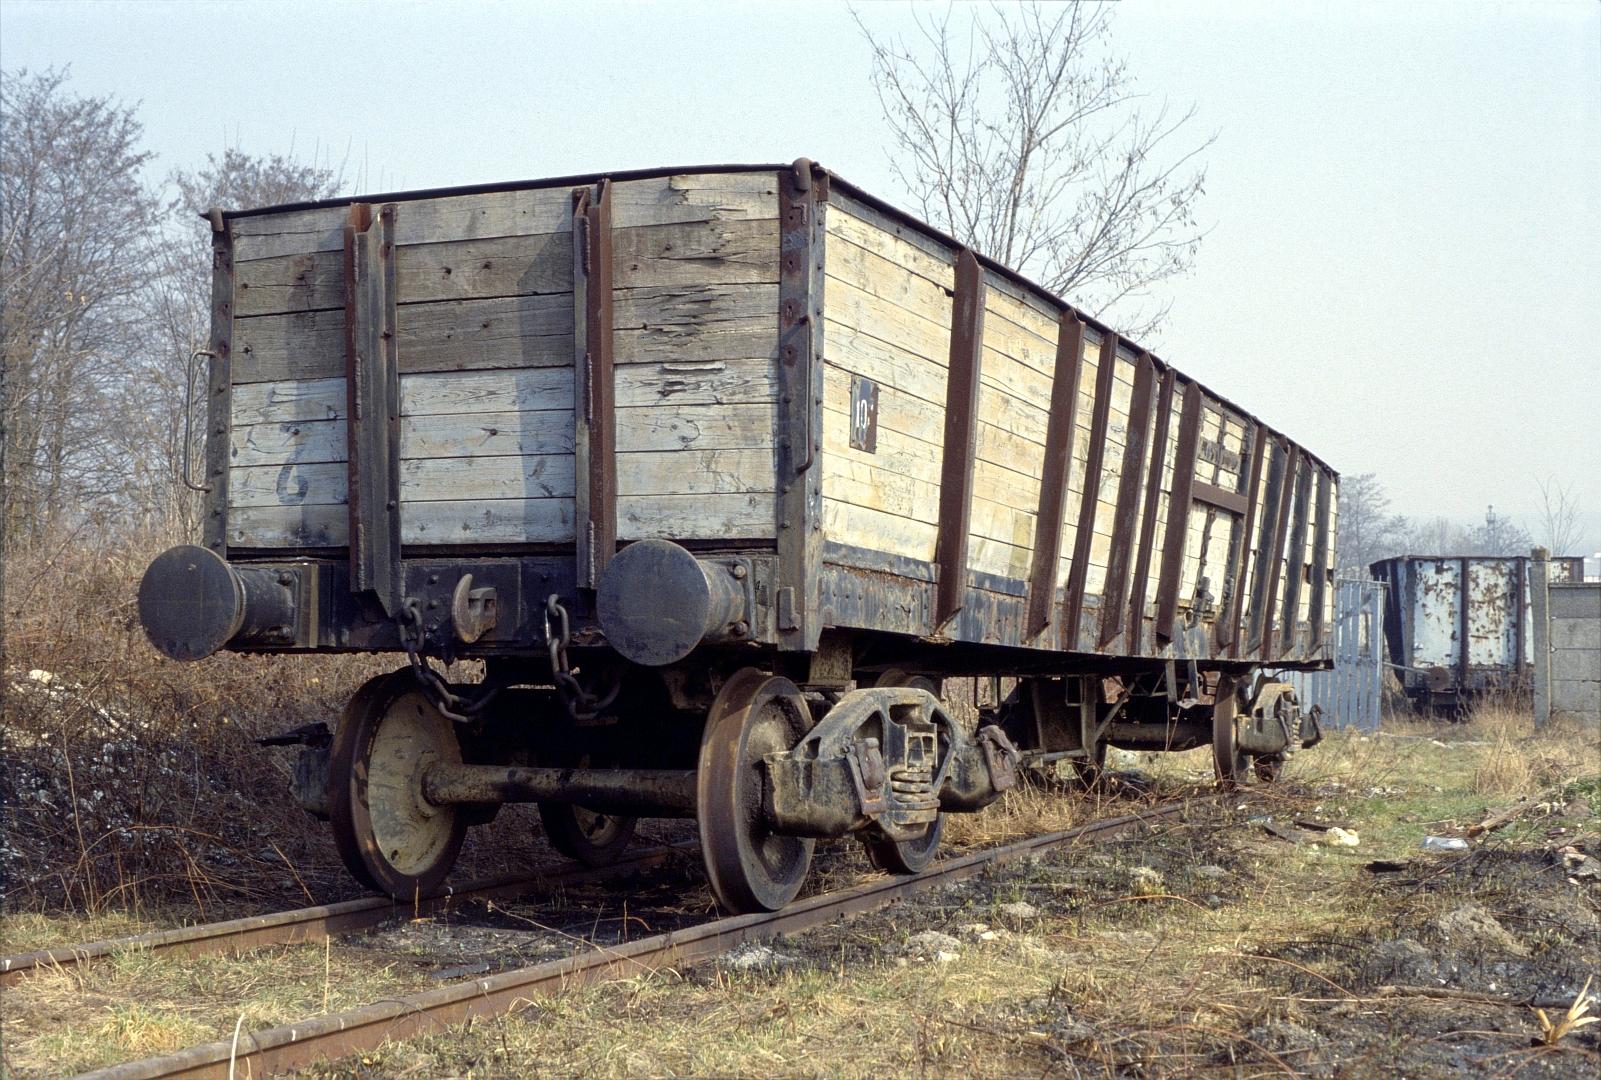 Miss wagon un altro regalo del mio moneyslave andrea rossi - 3 2